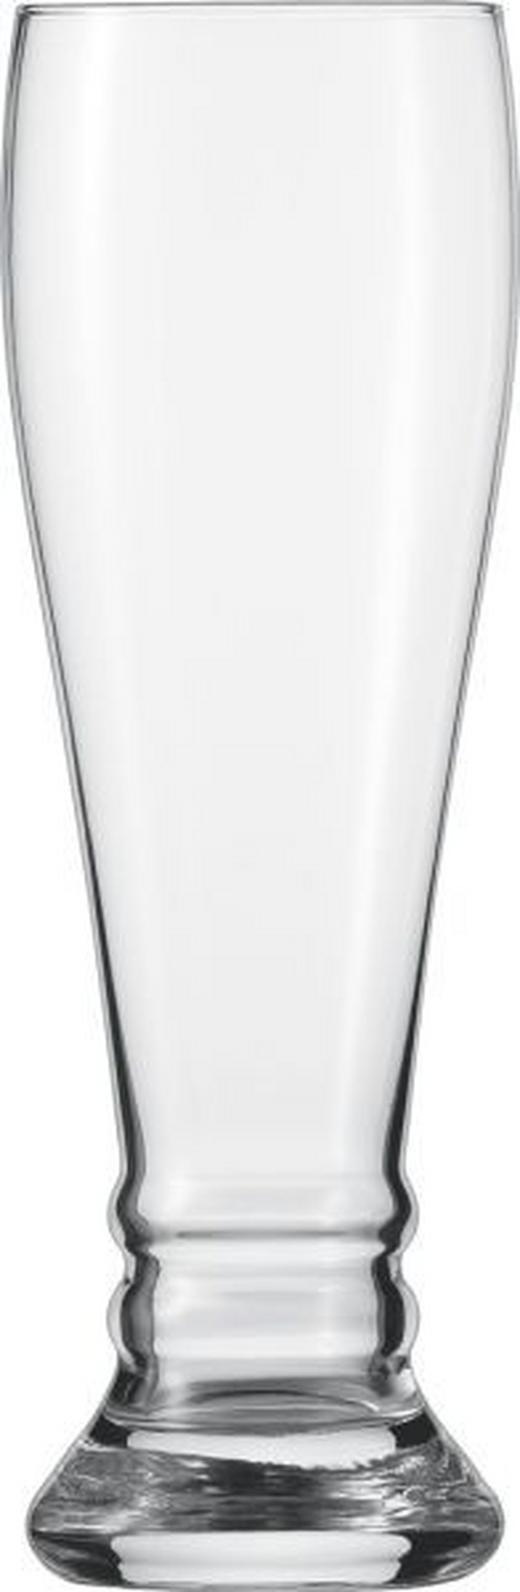 WEIZENBIERGLAS - Klar, Basics, Glas (8/25cm) - SCHOTT ZWIESEL